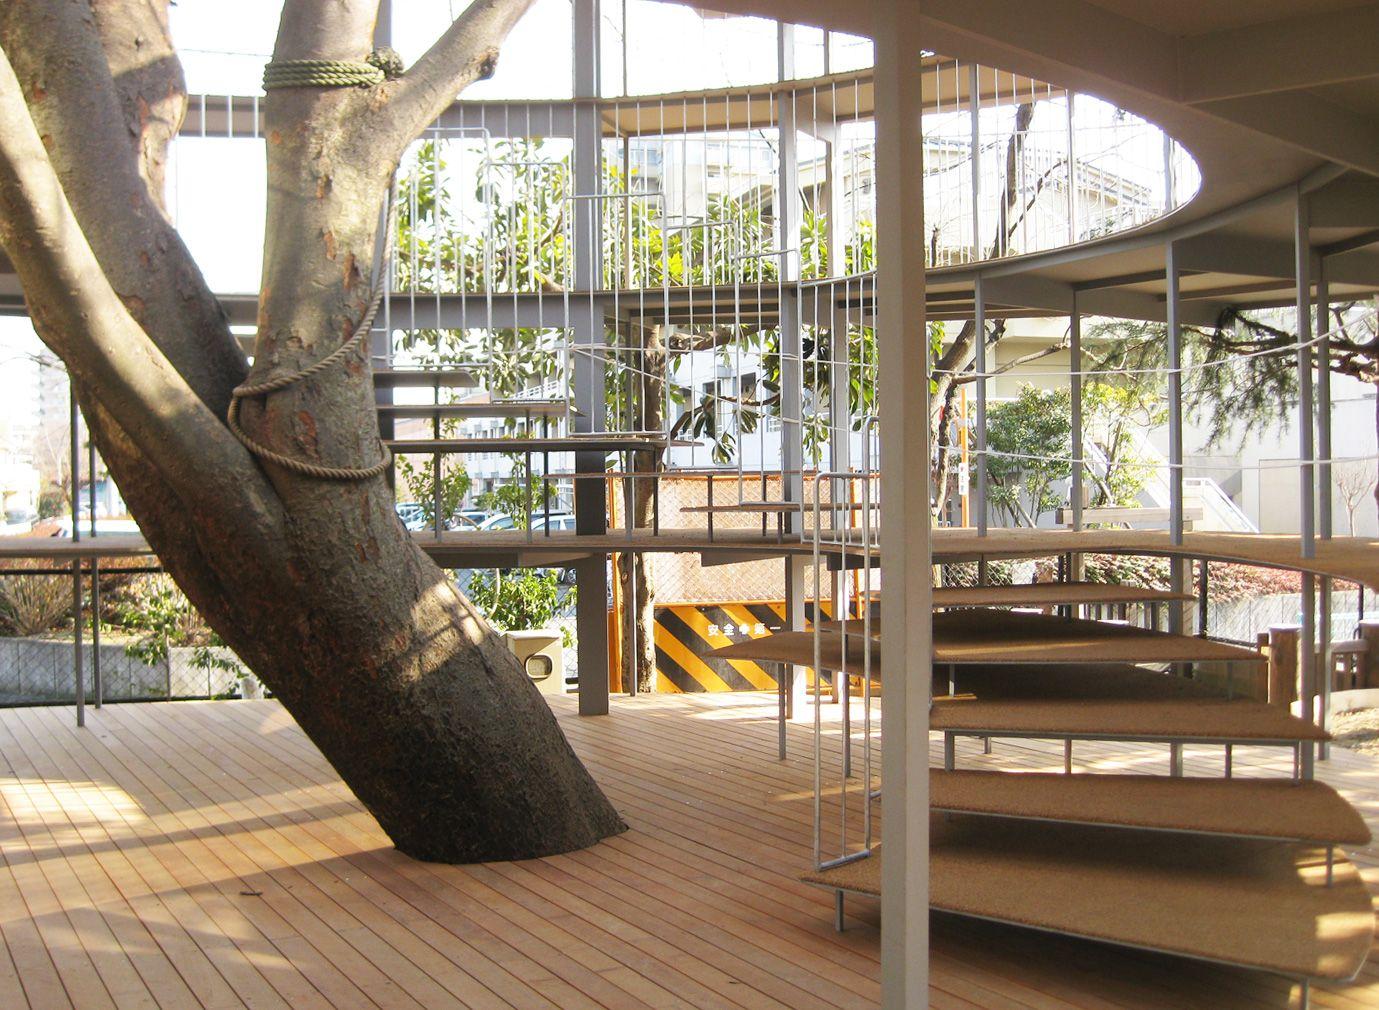 Kinder Garden: Fuji Kindergarten In Japan. By Yui And Takaharu Tezuka